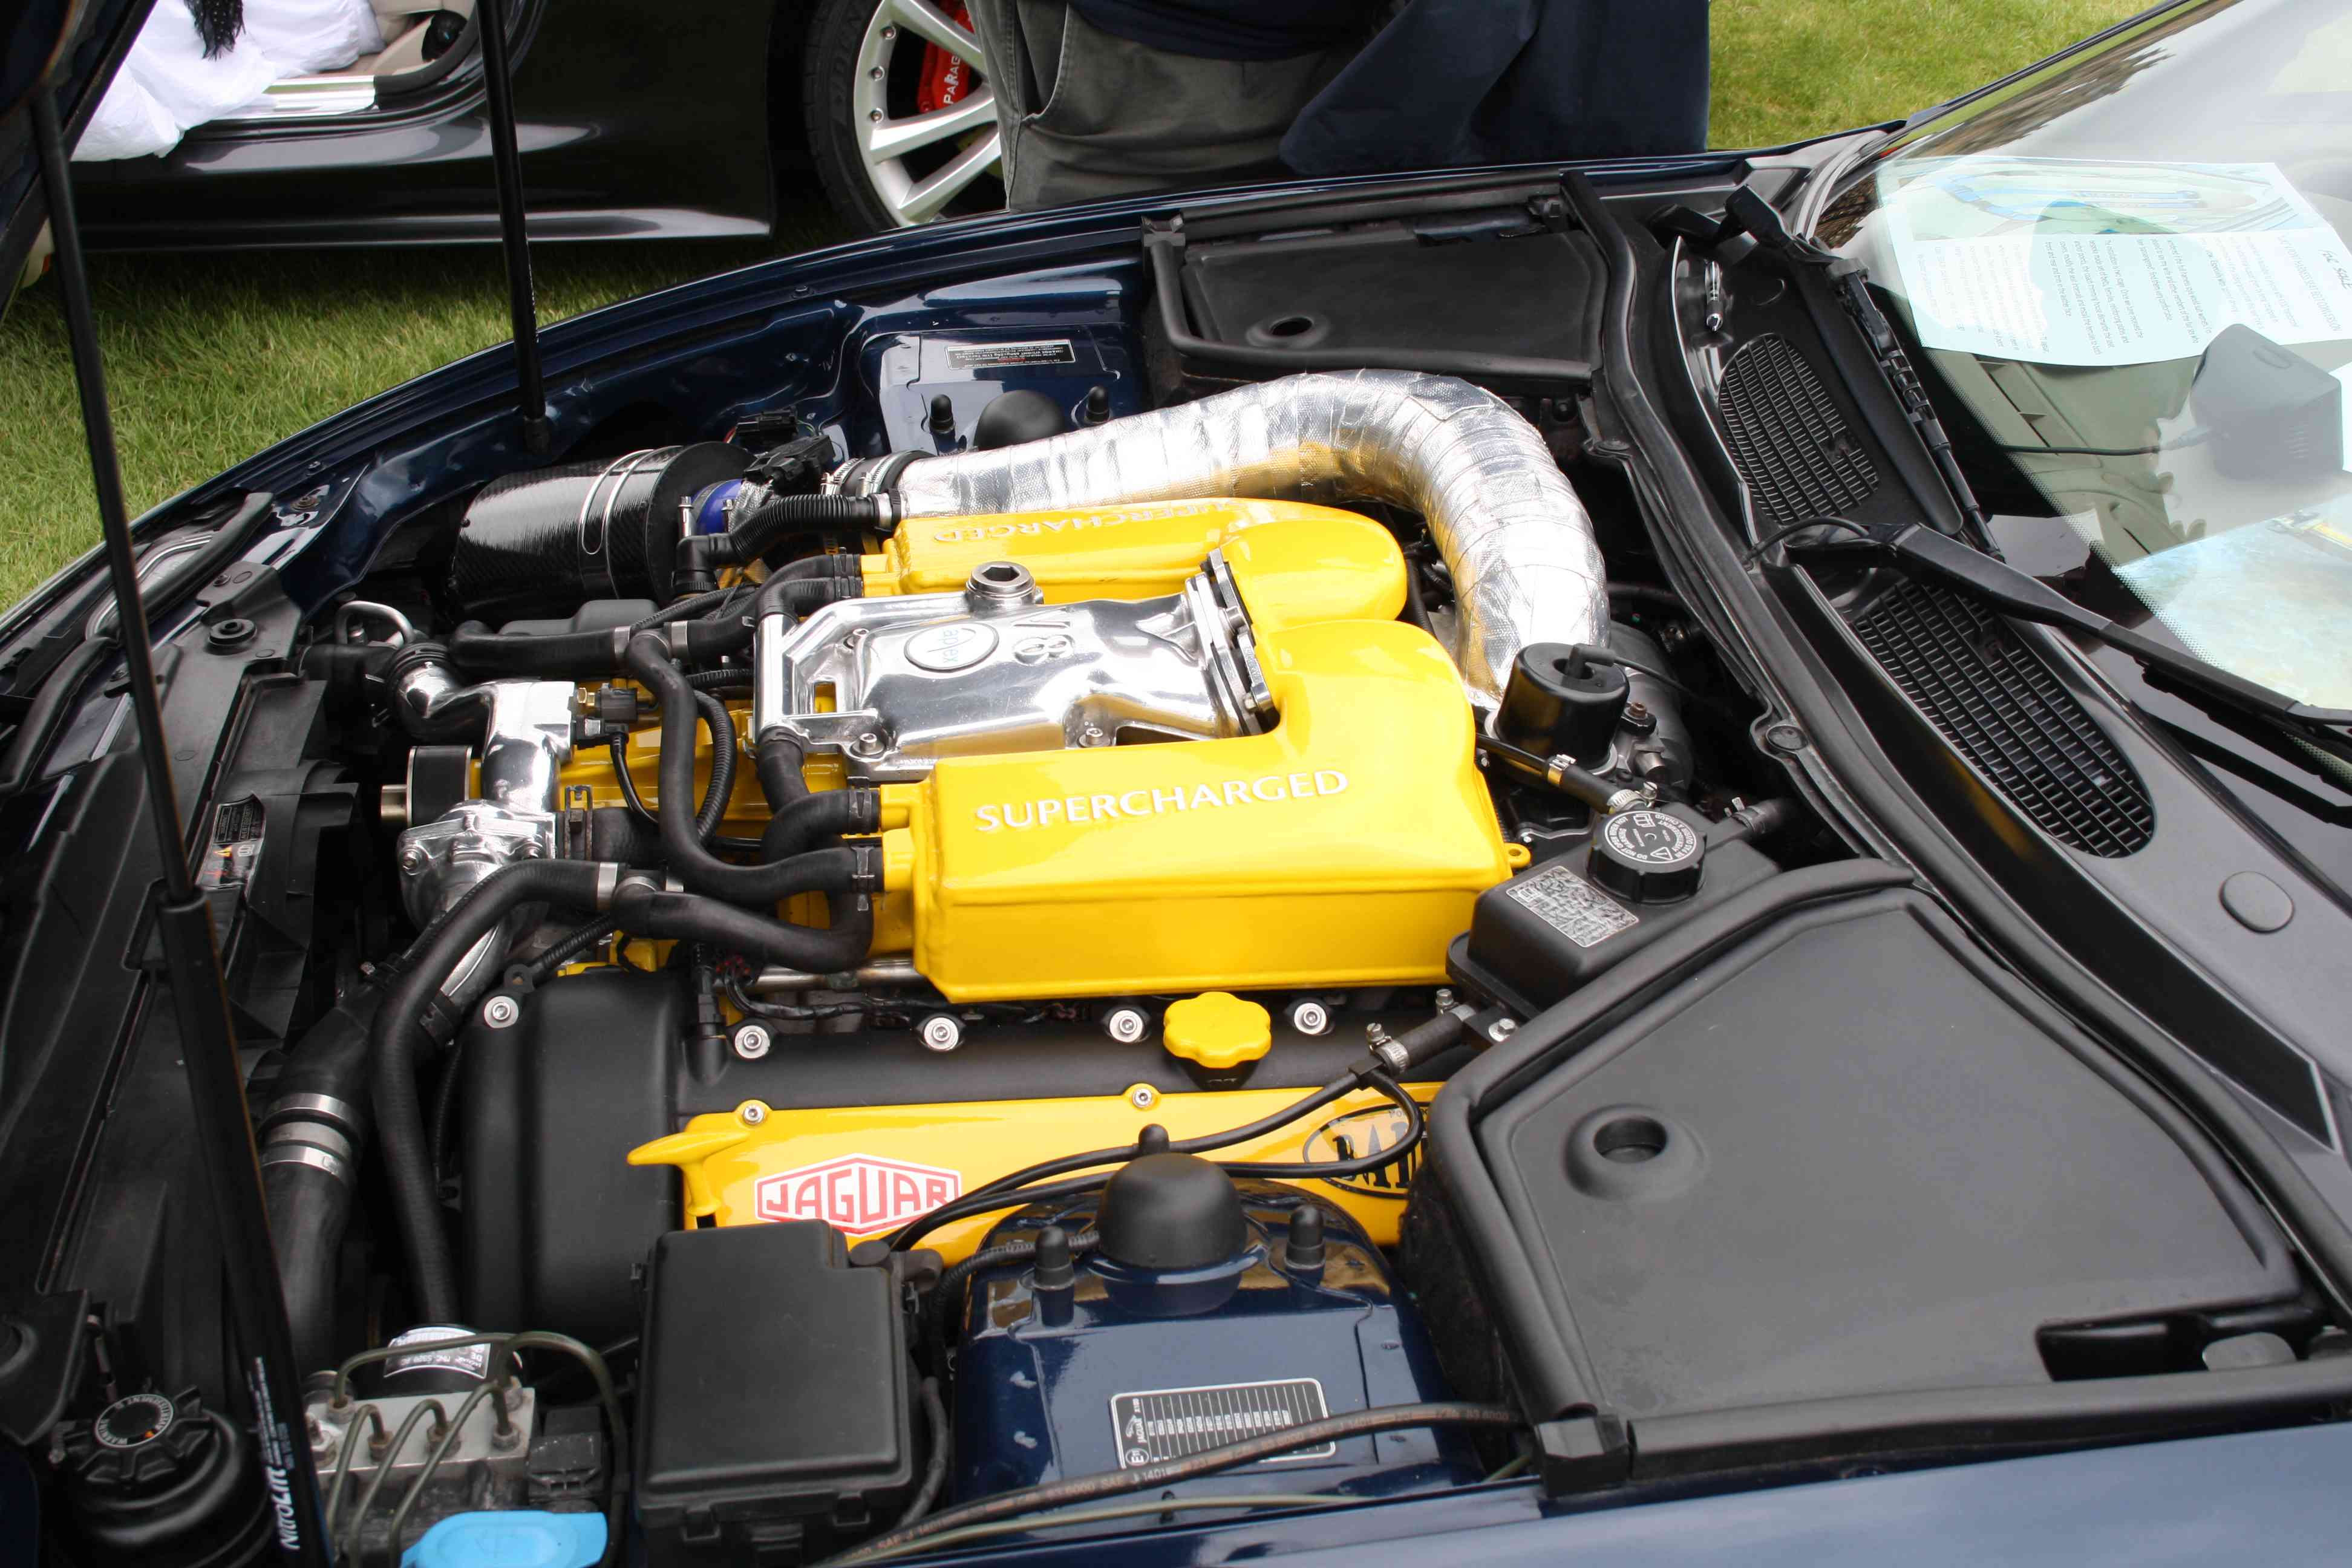 1999 Jaguar Xk8 Engine Diagram Guitar Amp Schematic Diagram Begeboy Wiring Diagram Source